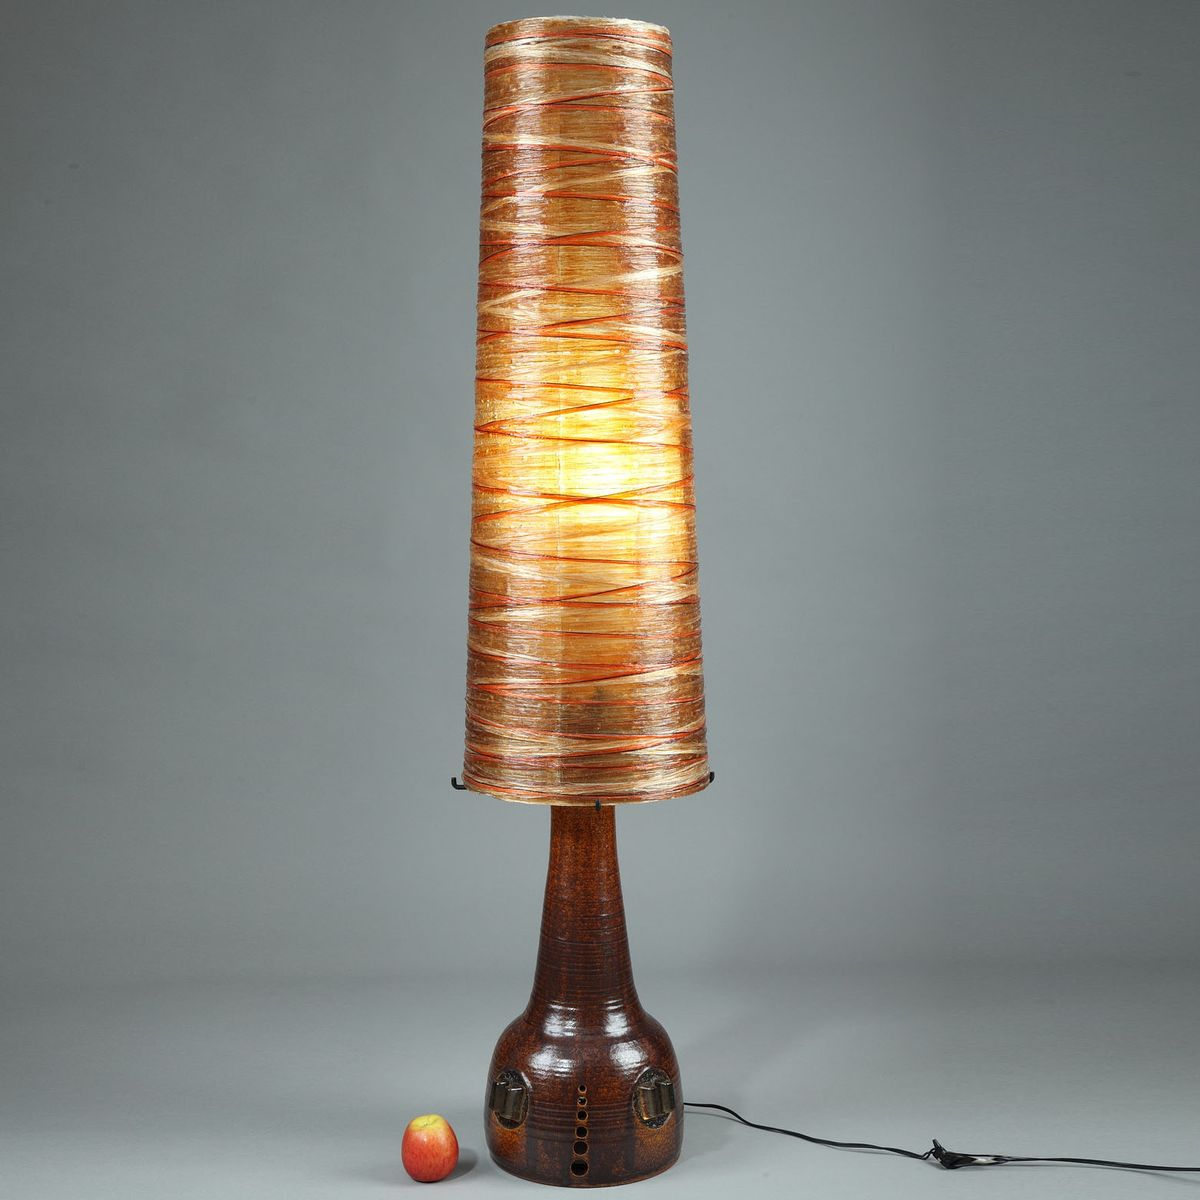 Hohe Keramik, Leinen & Harz Stehlampe von Les Ateliers Accolay, 1970er